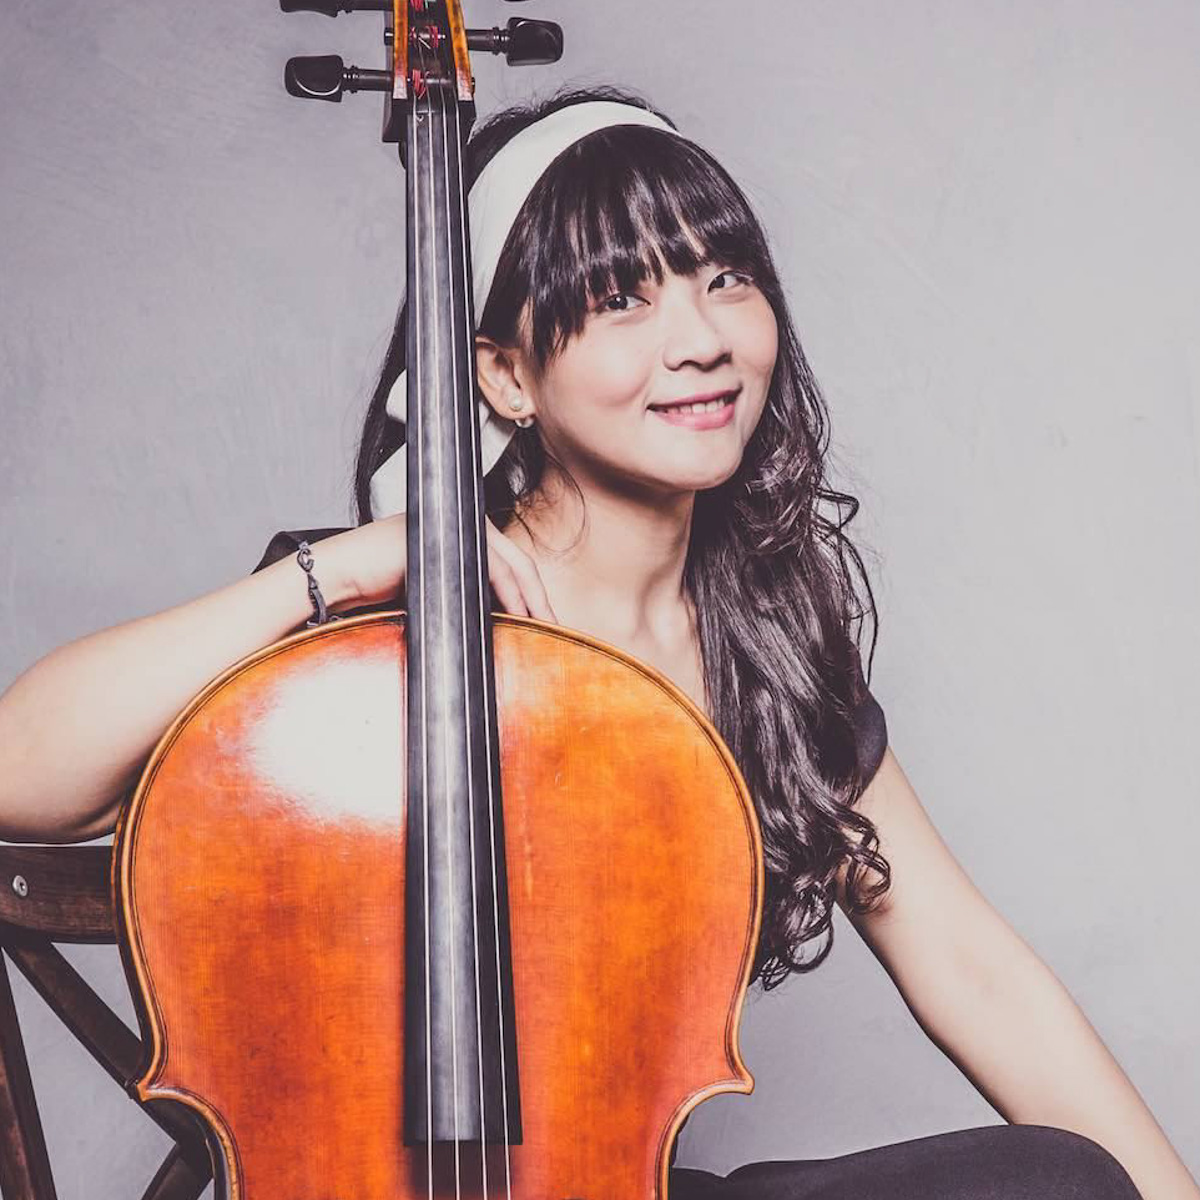 Kontrabass |Livemusik |Künstler |Band |Swing |Jazz |Empfang |Musiker |Buchen |Hannover |Hochzeit |Gala |Charity |Firmenfeier |Geburtstag |Anfragen |Mieten |Lehmann |Eventservice